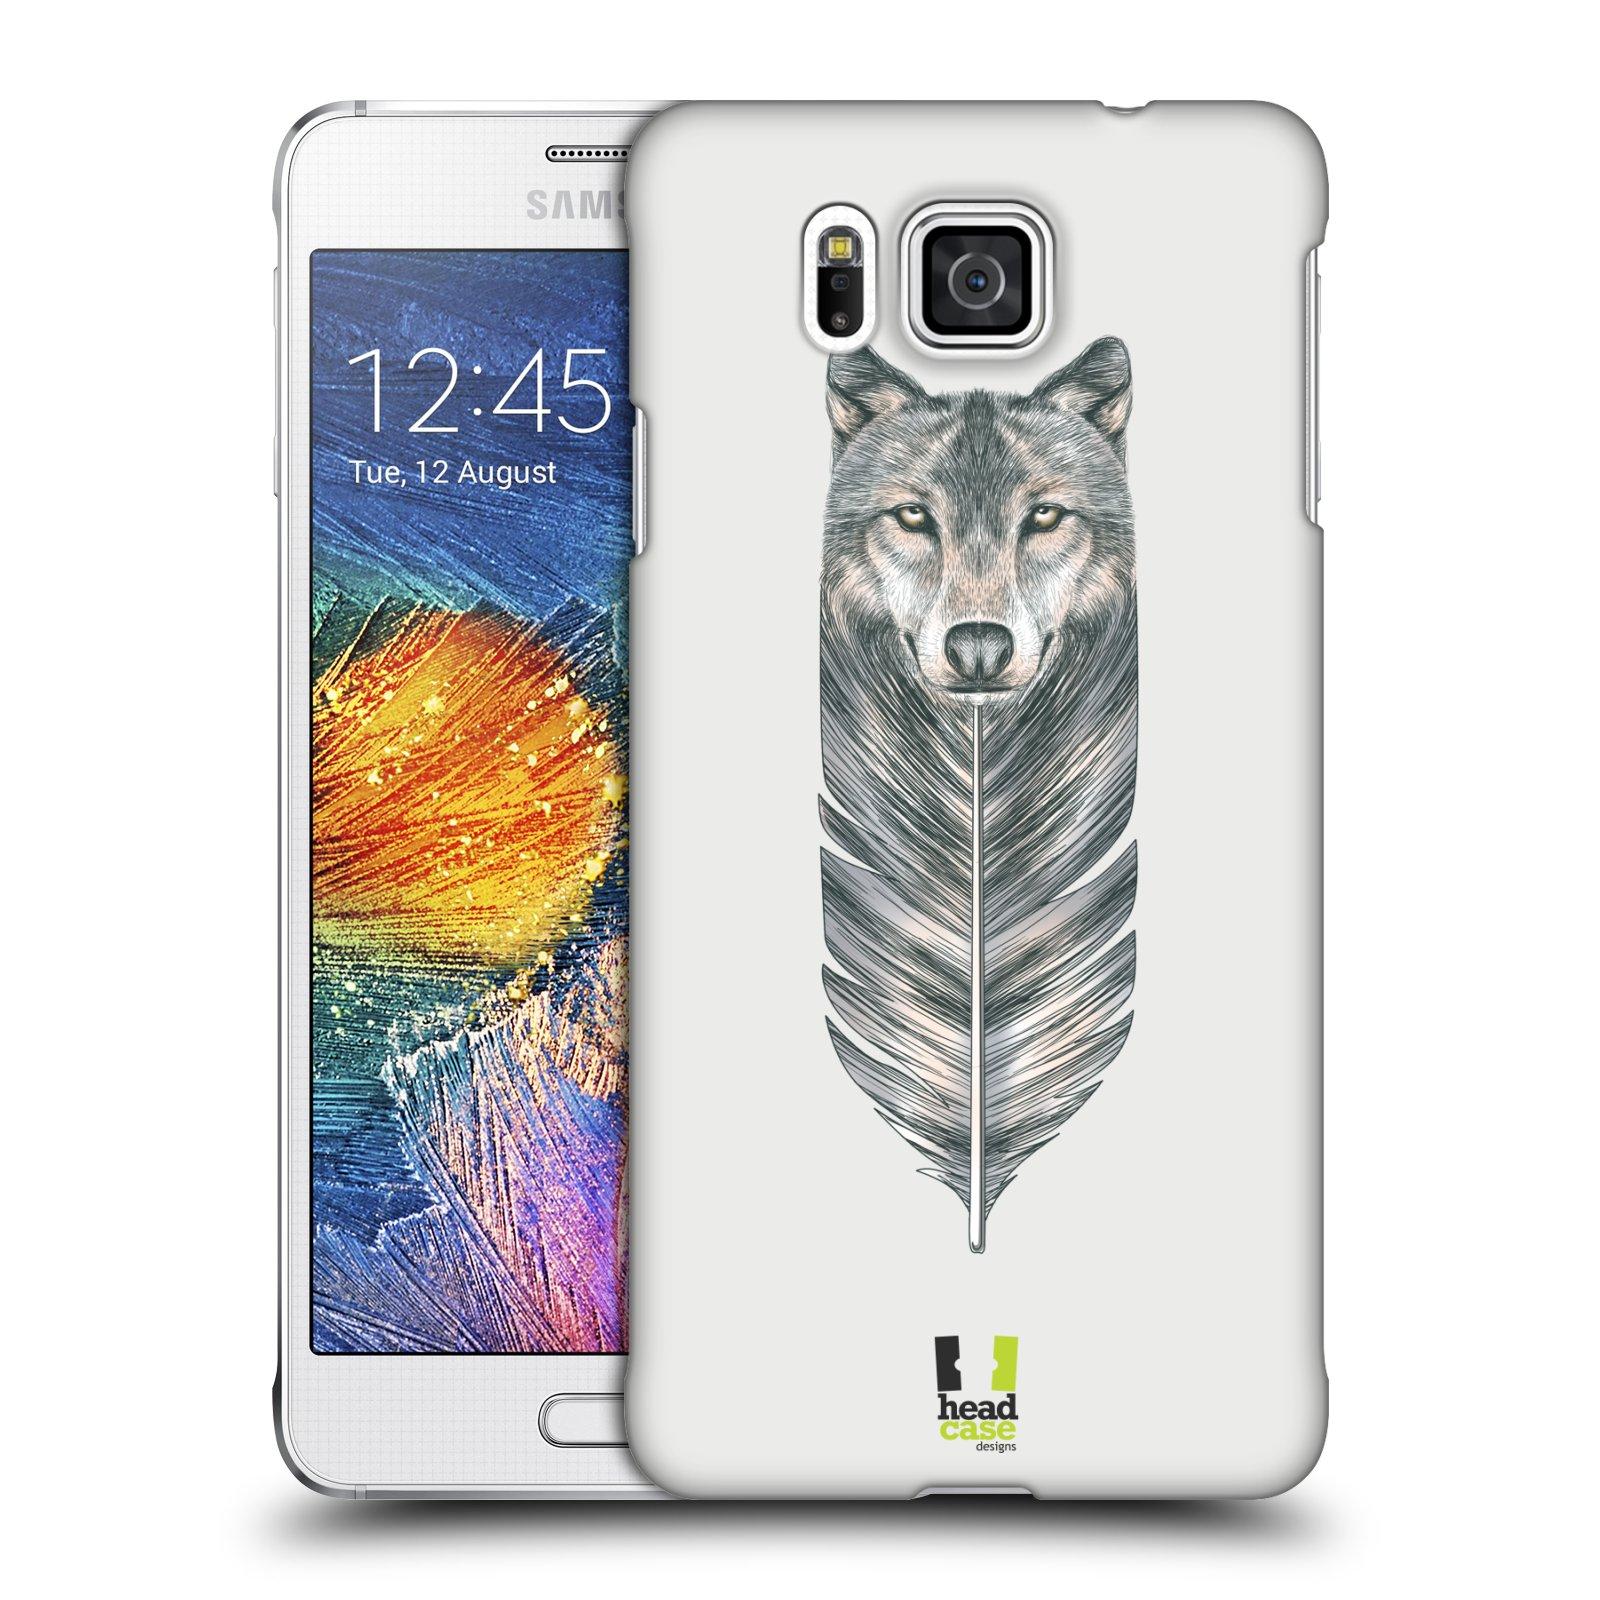 HEAD CASE plastový obal na mobil SAMSUNG Galaxy Alpha (G850) vzor zvířecí pírka vlk